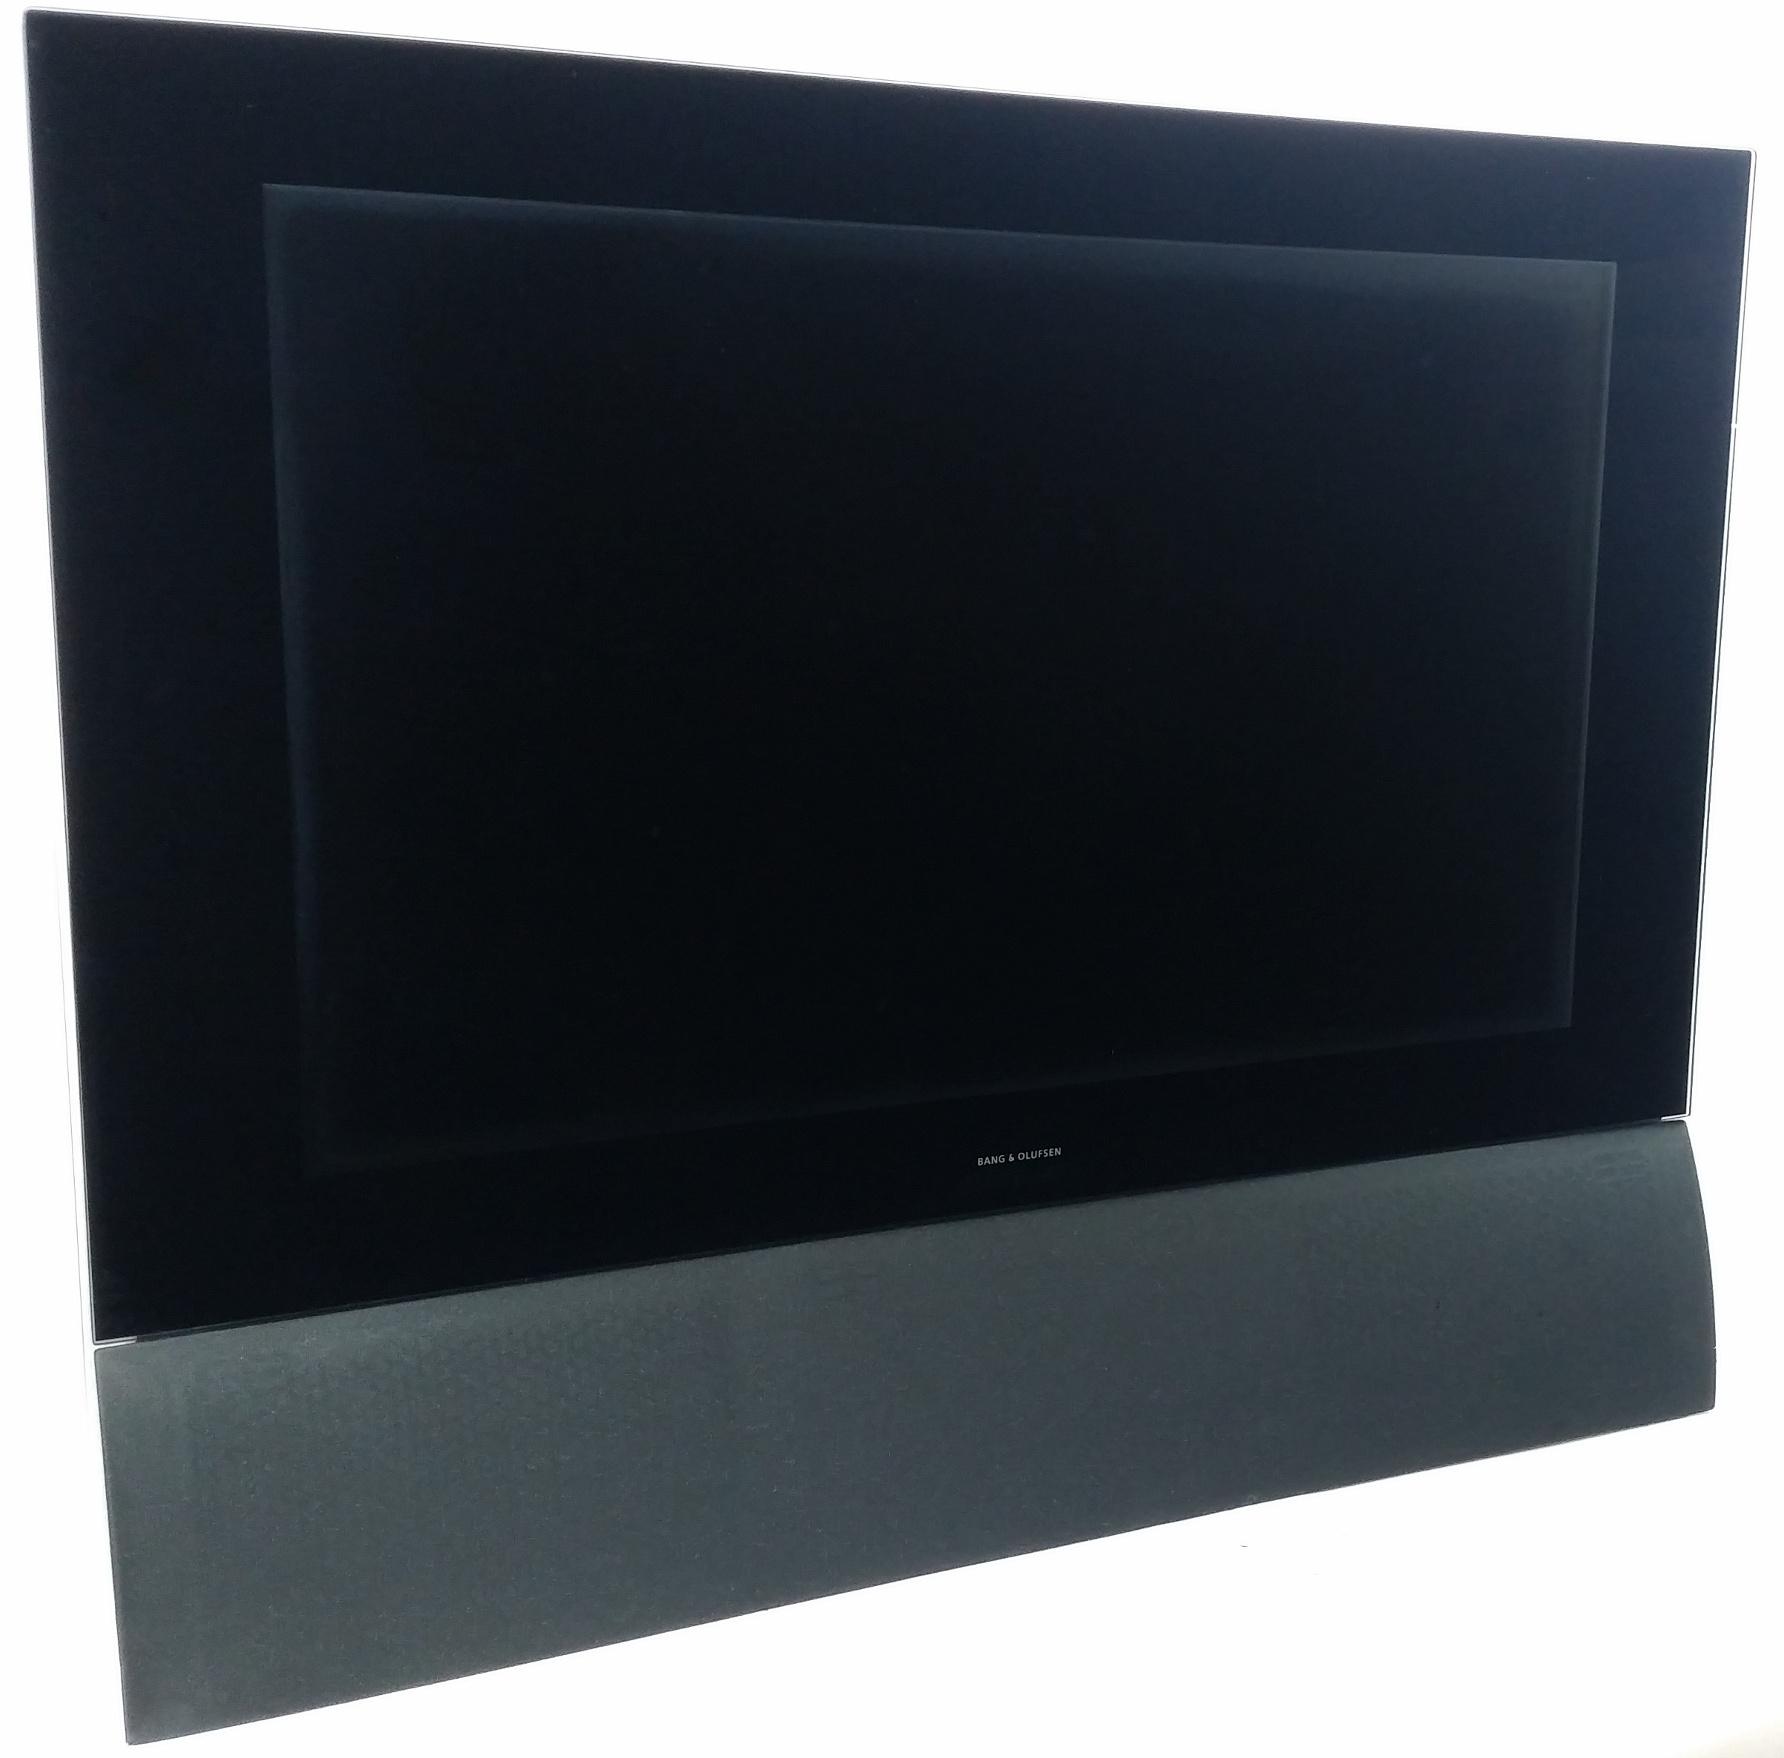 b o bang olufsen lcd 26 66cm beovision 6 26 mit beo4 ebay. Black Bedroom Furniture Sets. Home Design Ideas